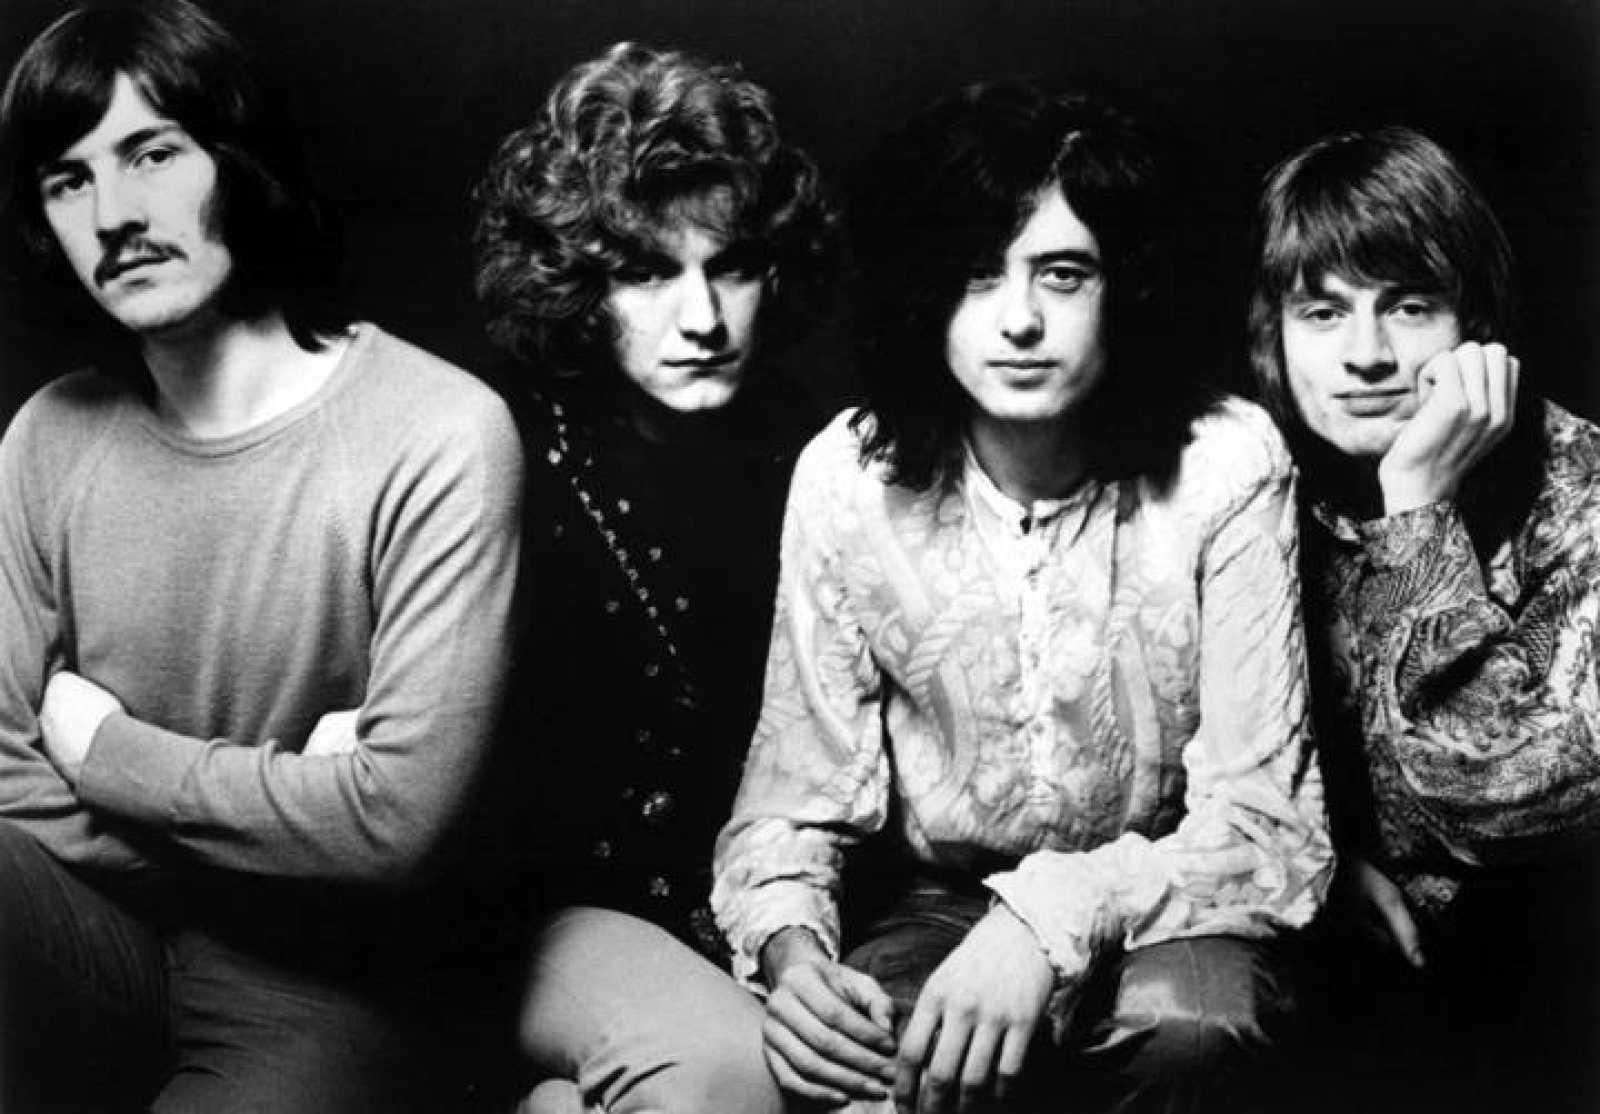 Imagen de Led Zeppelin en sus inicios, en 1968.